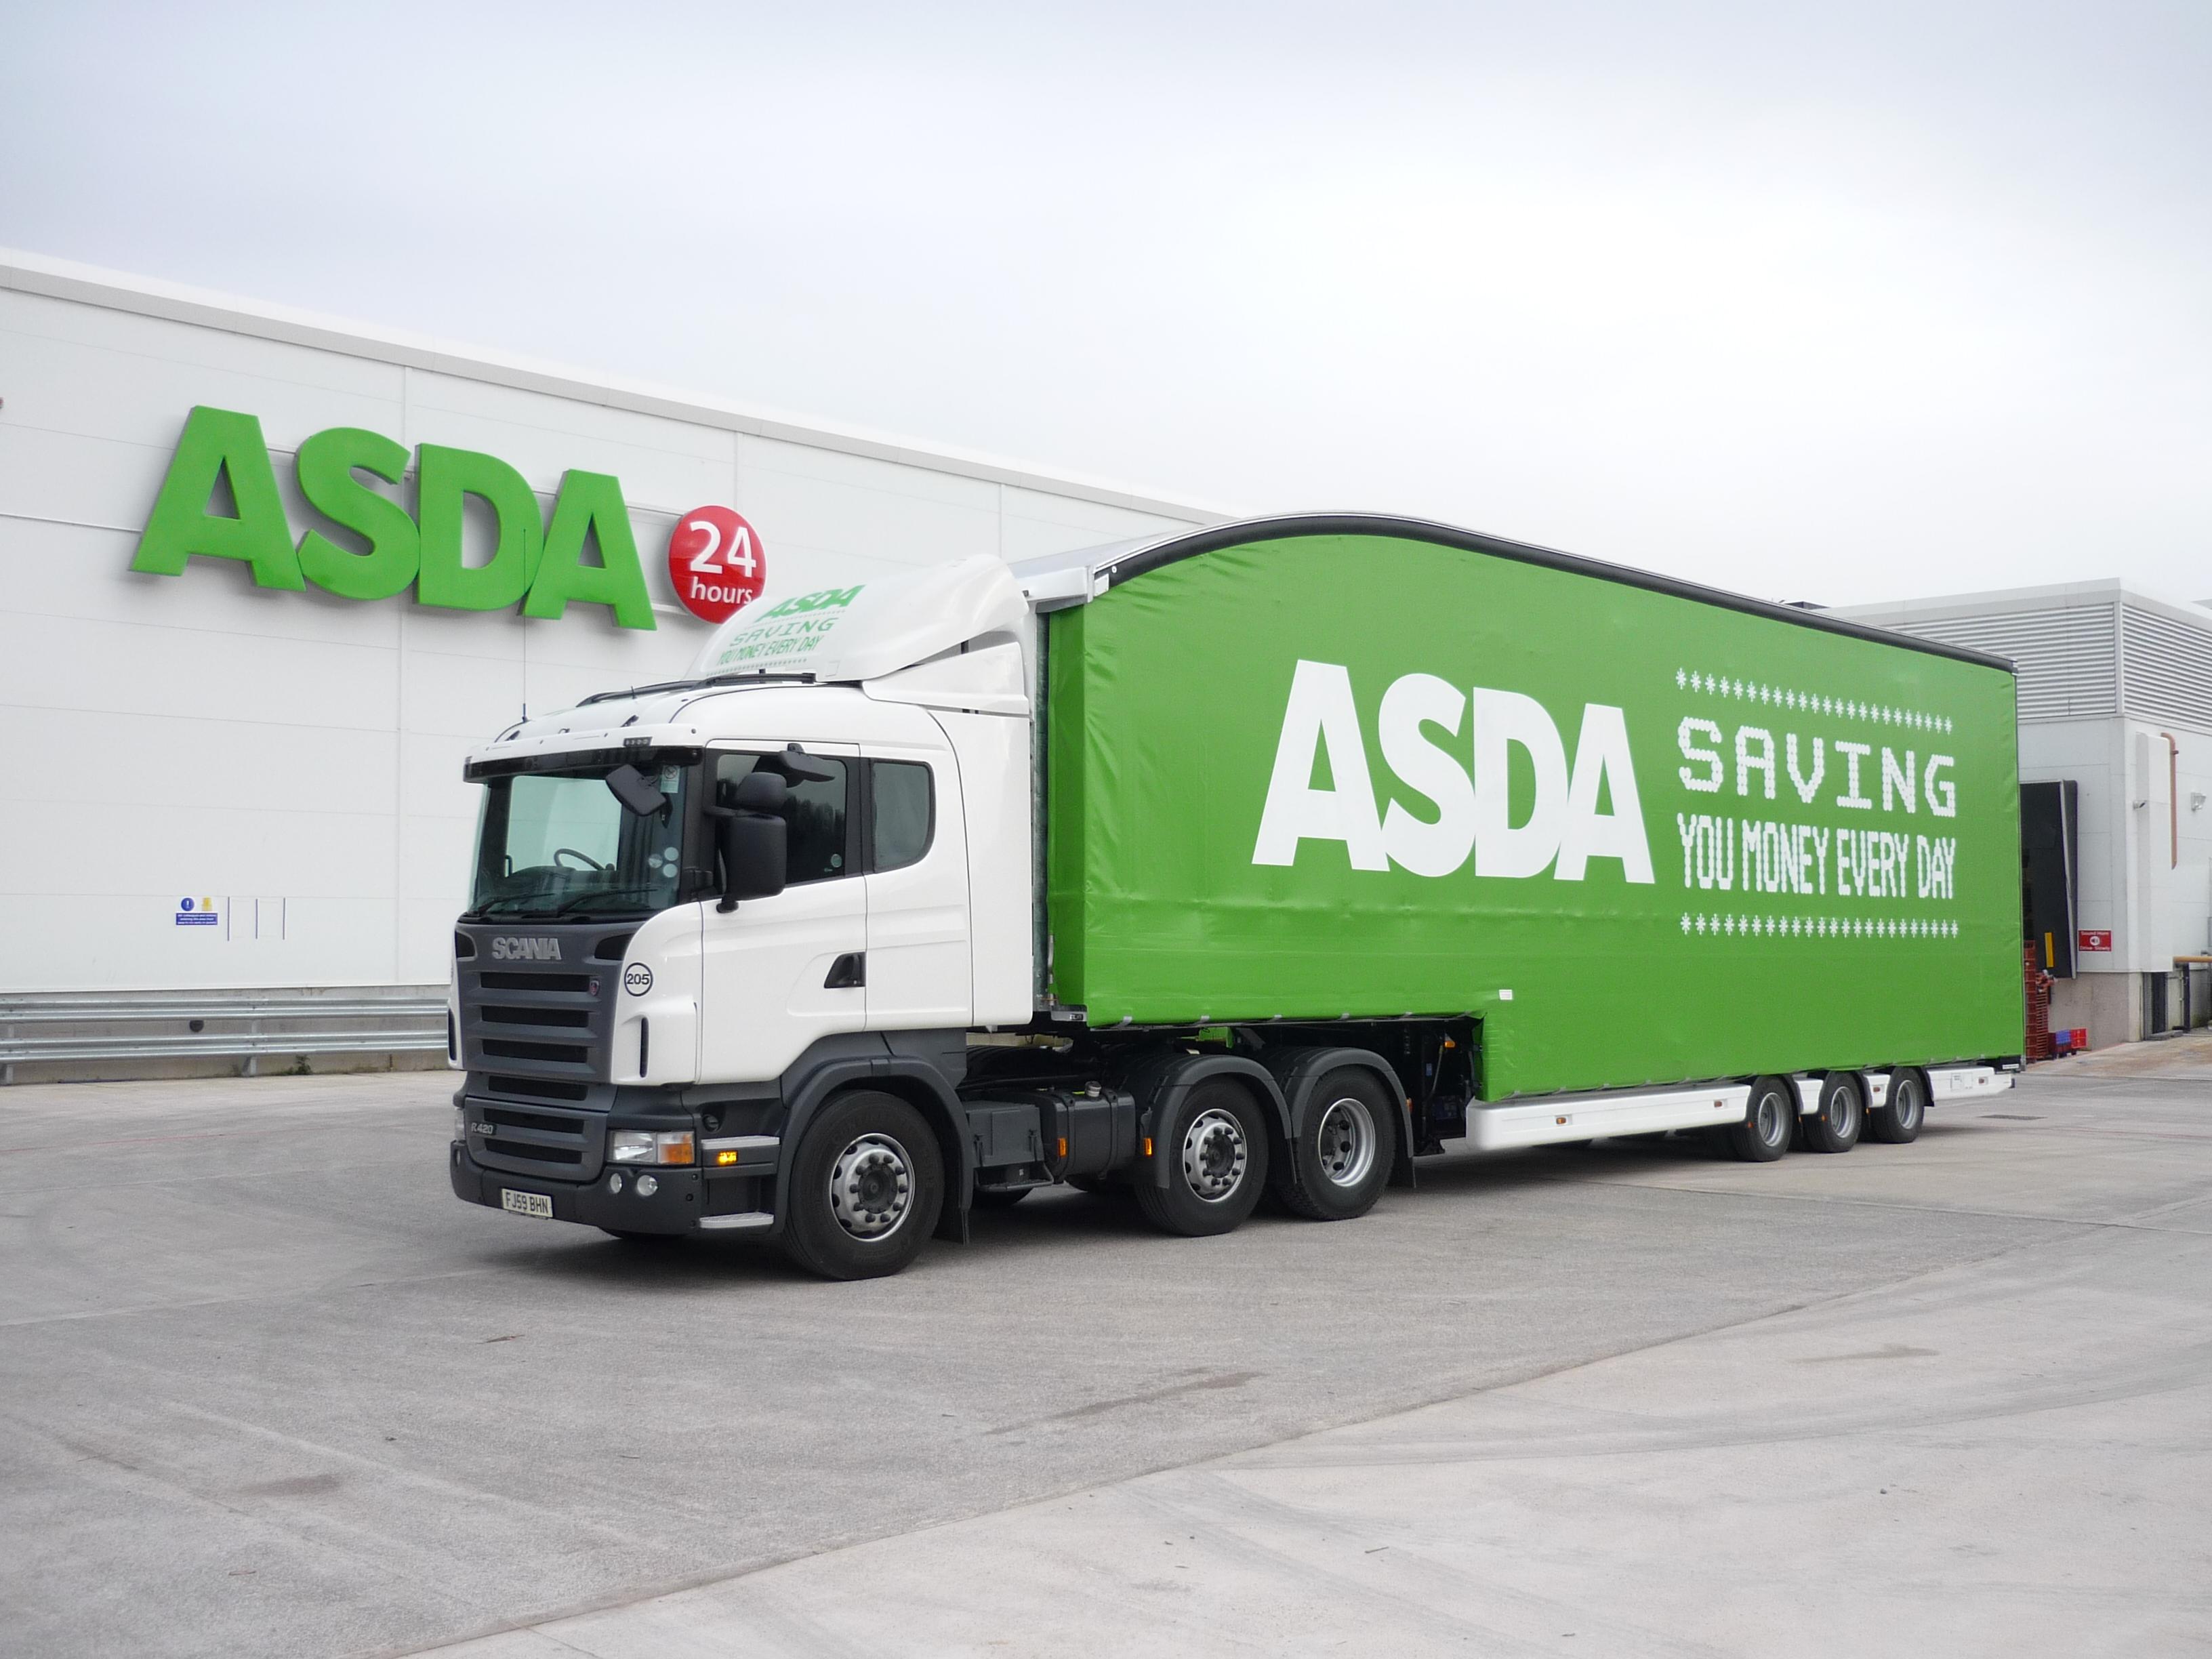 Asda United Kingdom truck